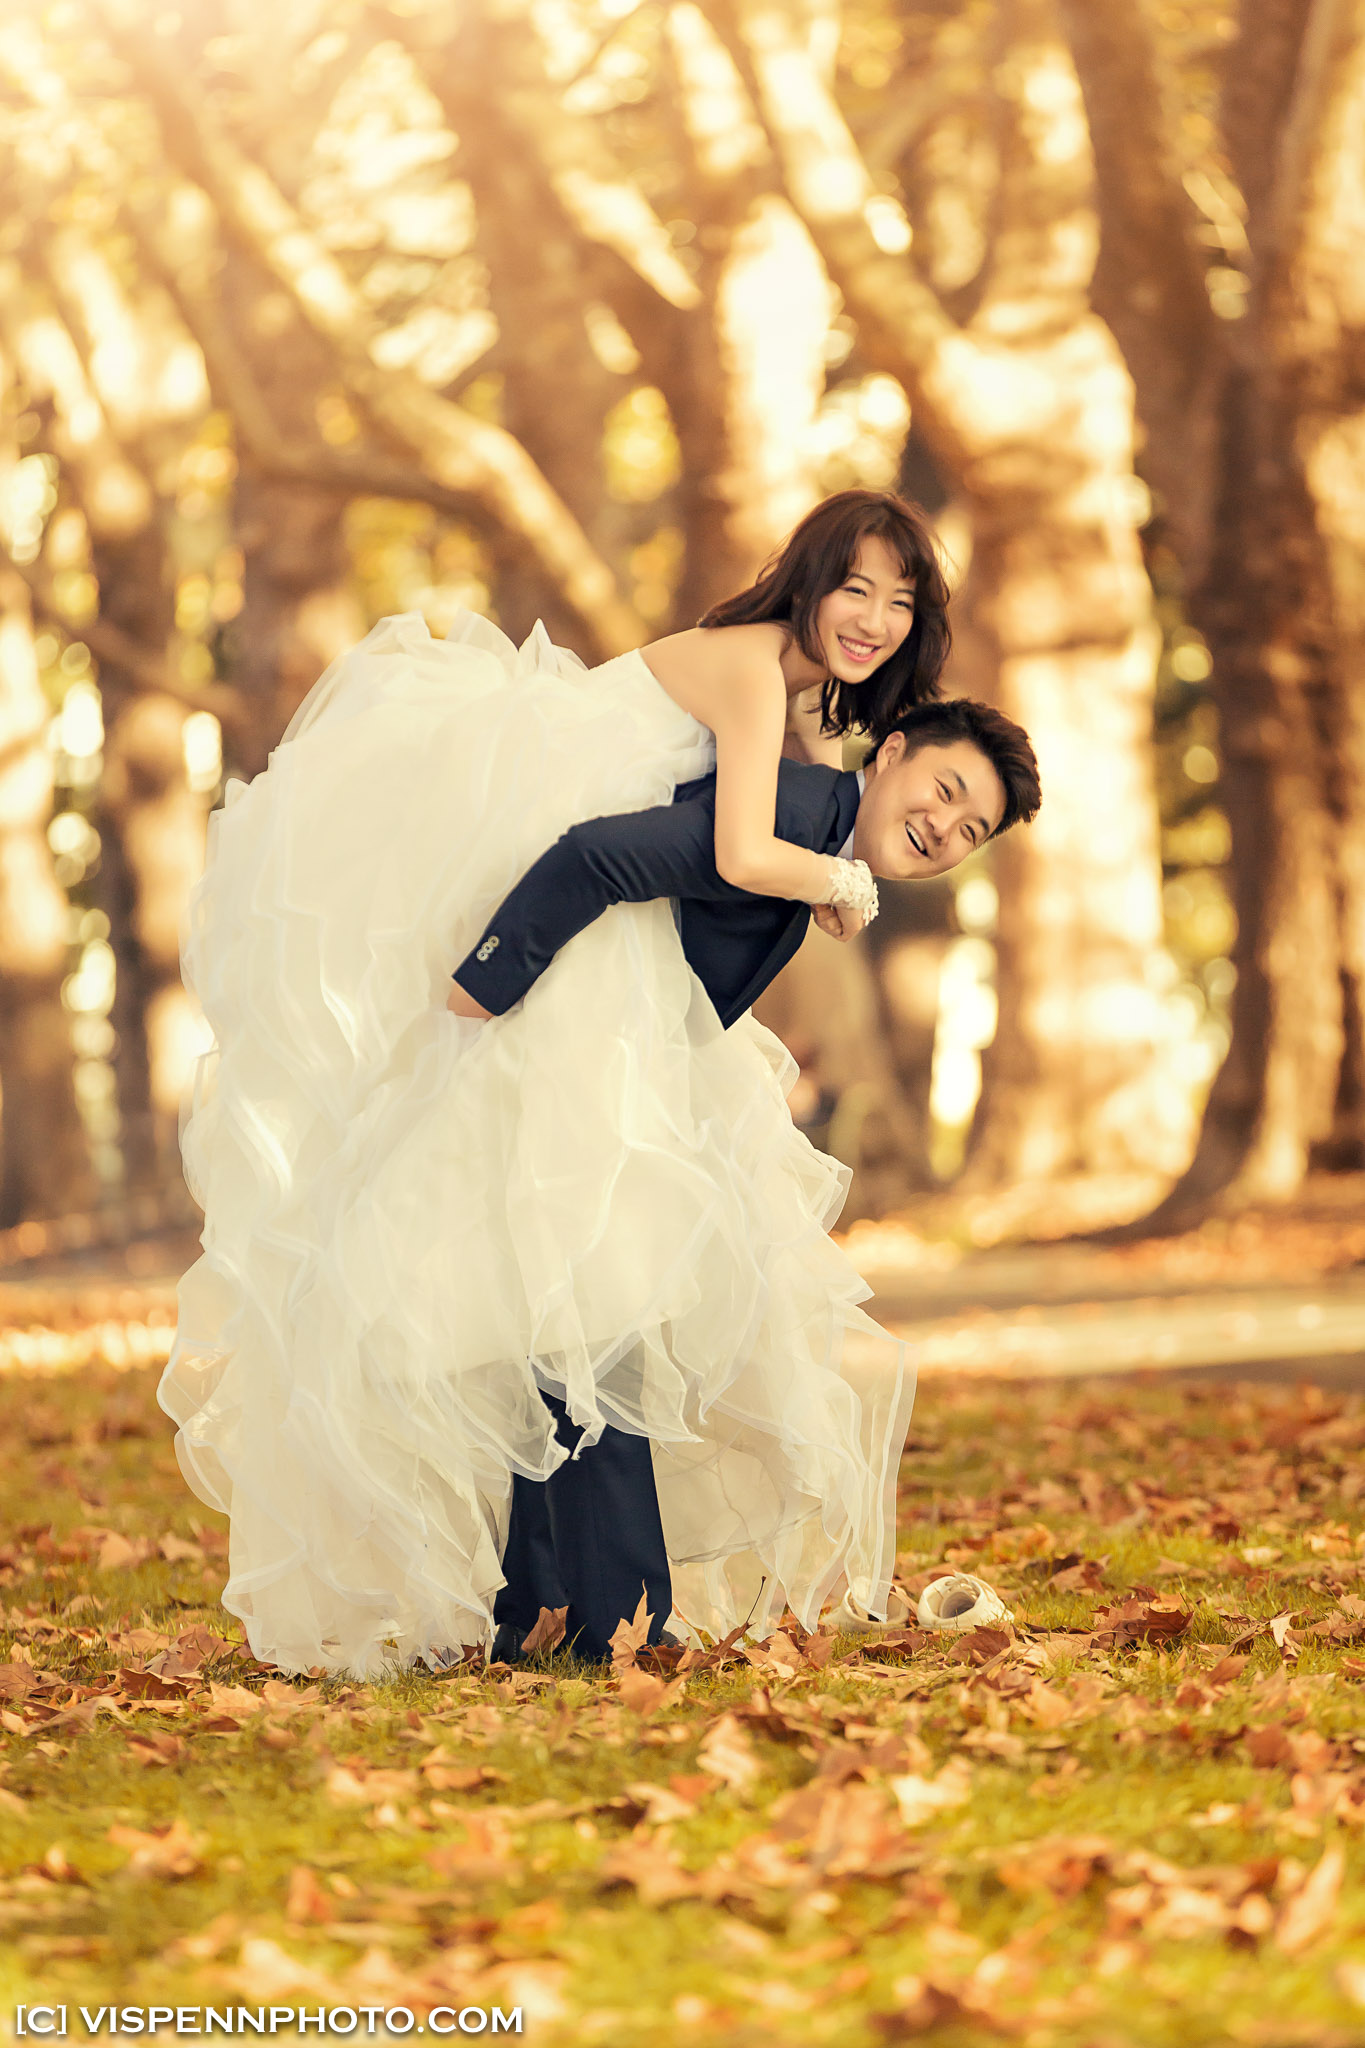 PRE WEDDING Photography Melbourne VISPENN 墨尔本 婚纱照 结婚照 婚纱摄影 5D1 2898